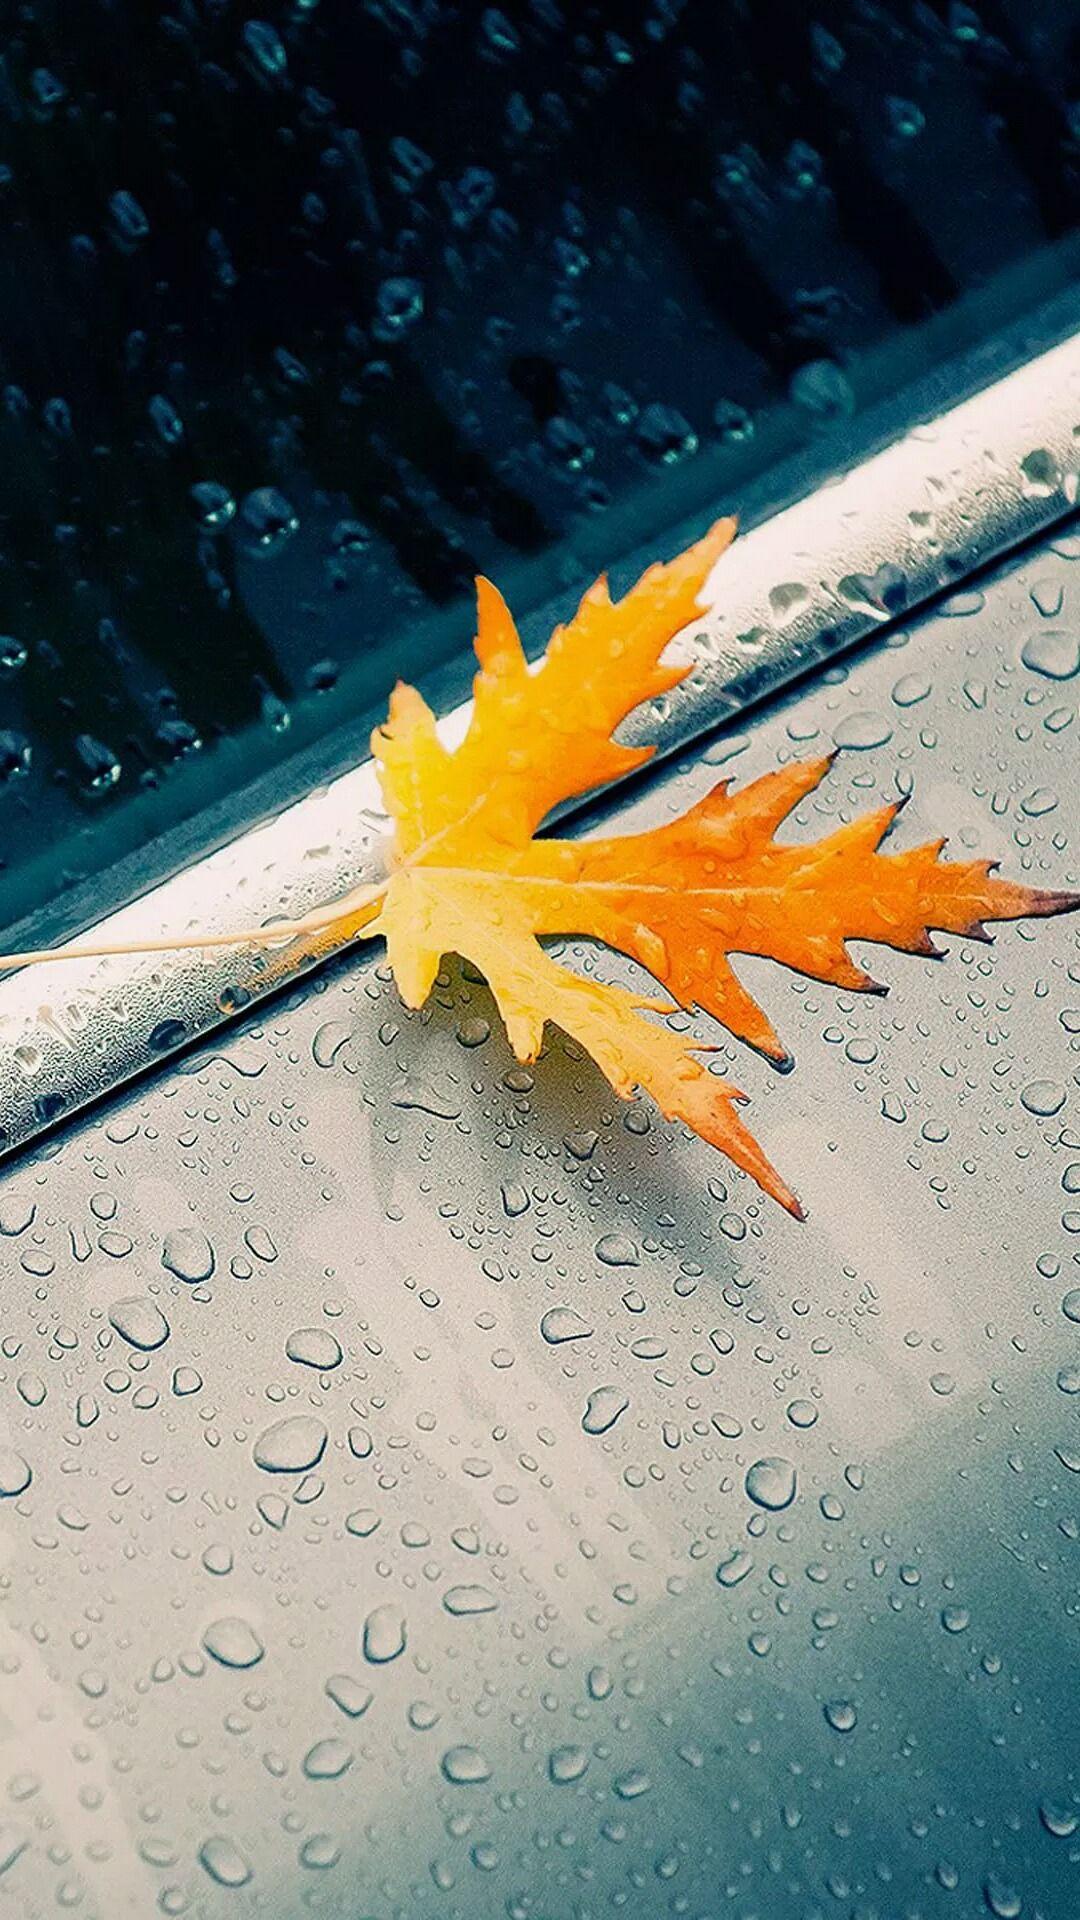 Autumn Rain iPhone wallpapers. Tap to see more Fall season